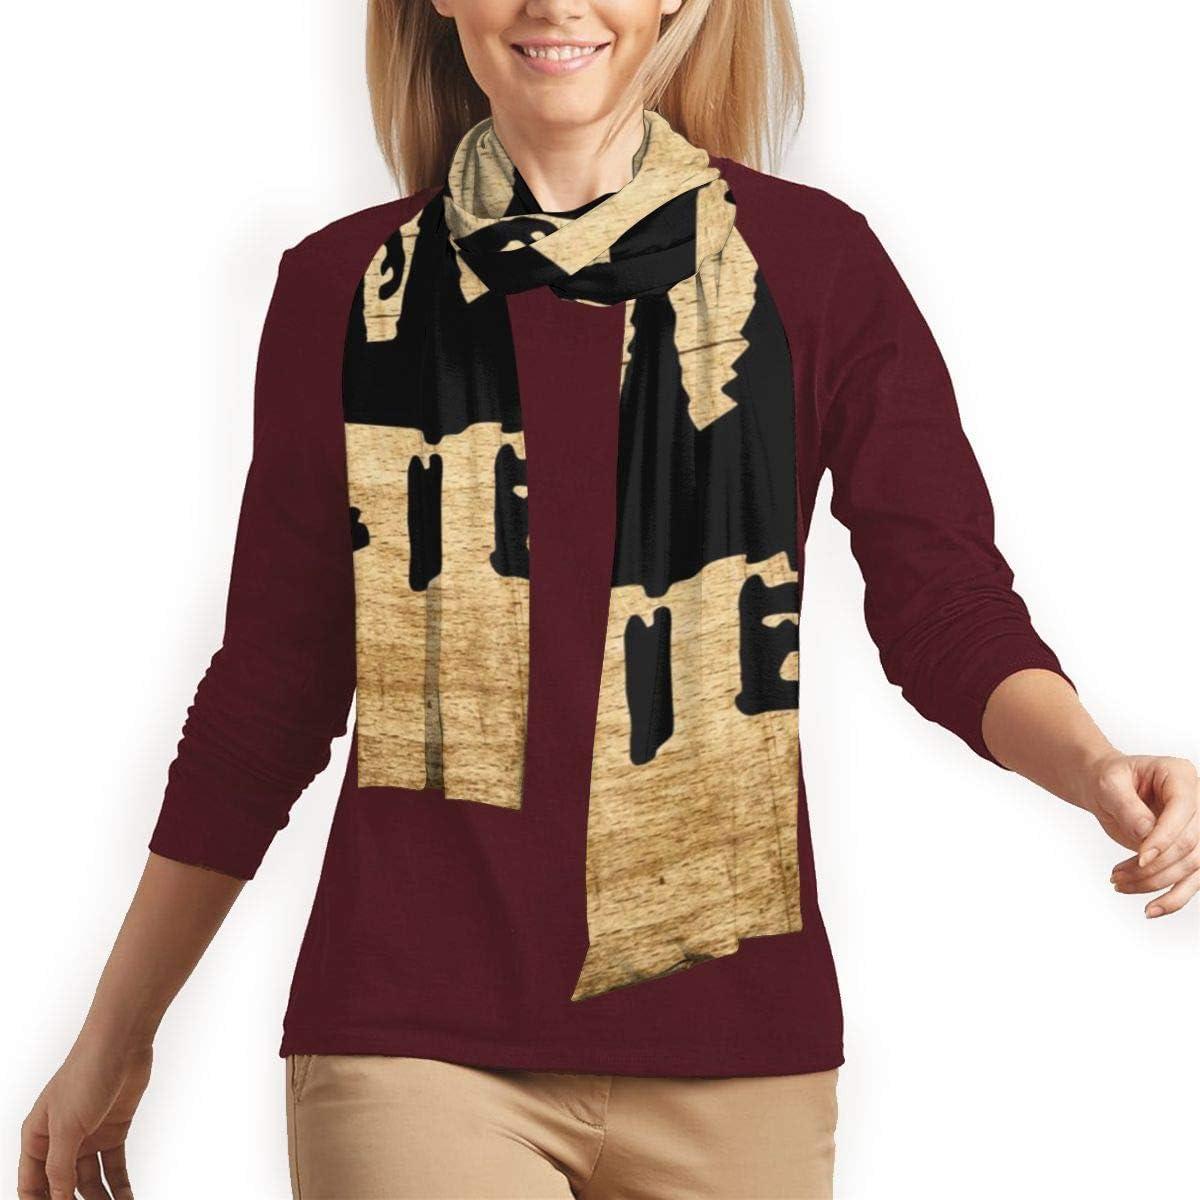 Black Orangutan Animal Black Silhouette Super Soft Long Scarf Shawl Fashion Lightweight Scarves Wraps For Women Men